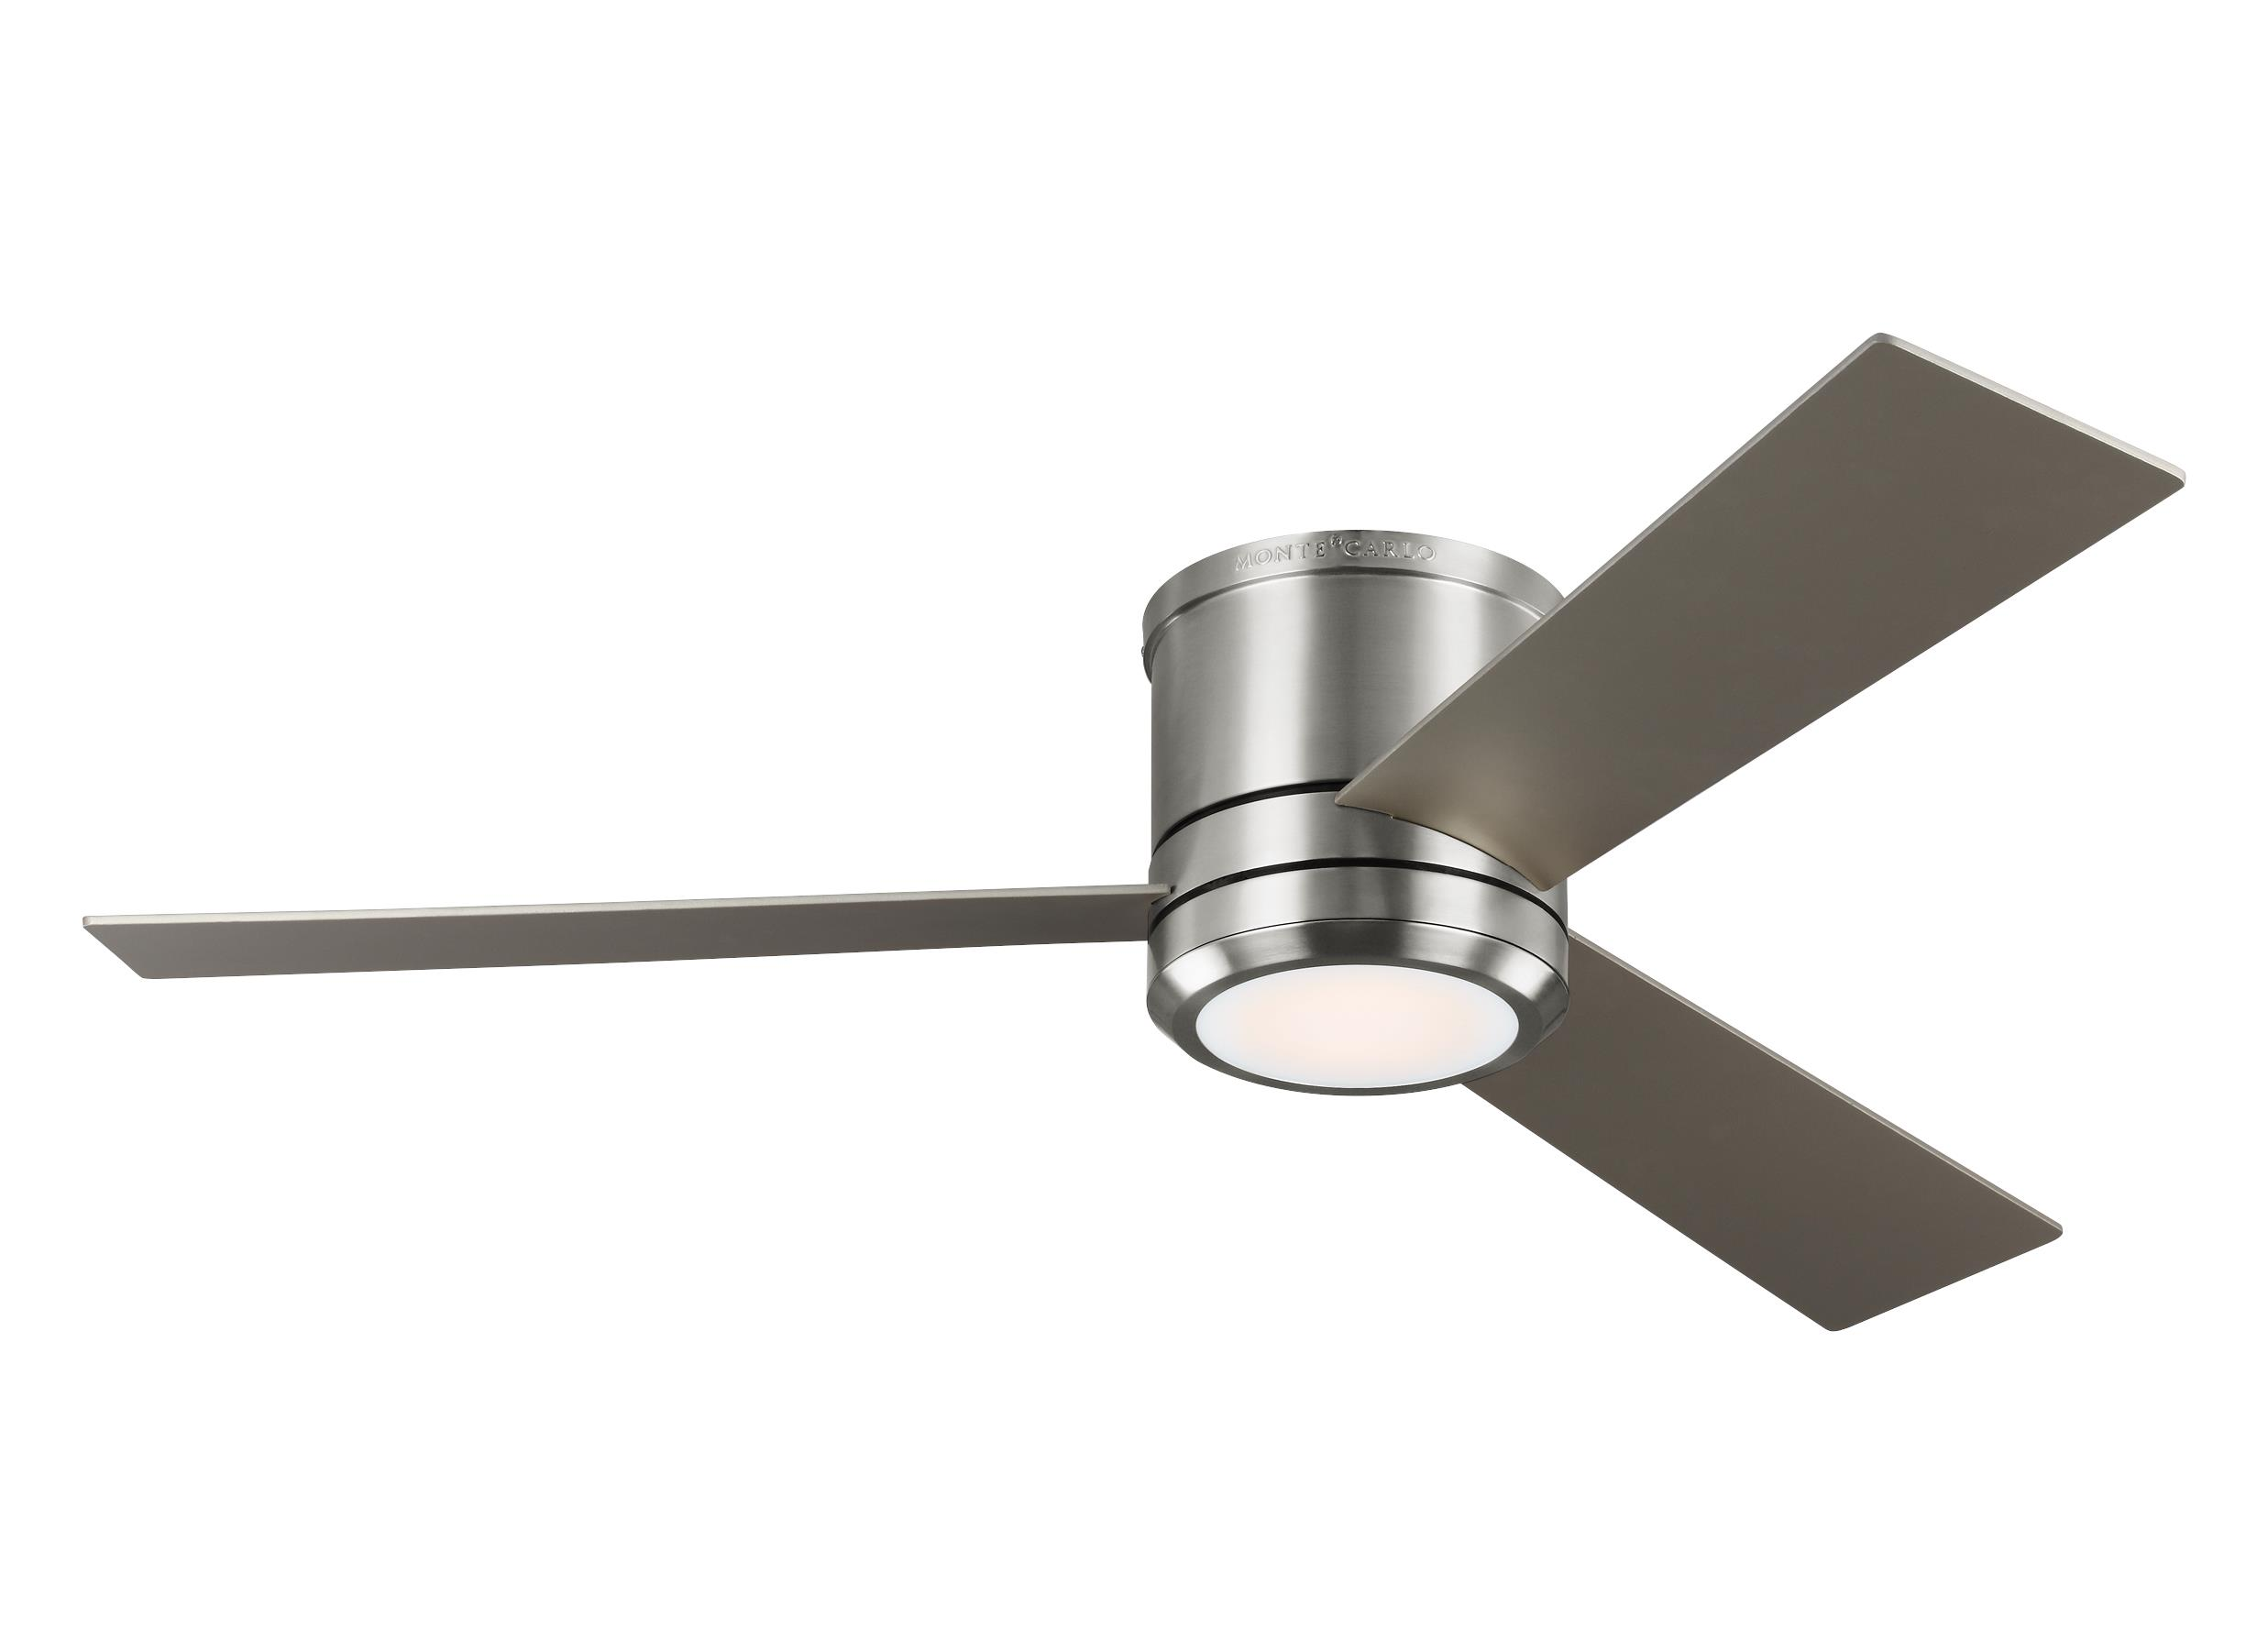 Modern Ceiling Fan Lights: Clarity Max Ceiling Fan with Light,Lighting